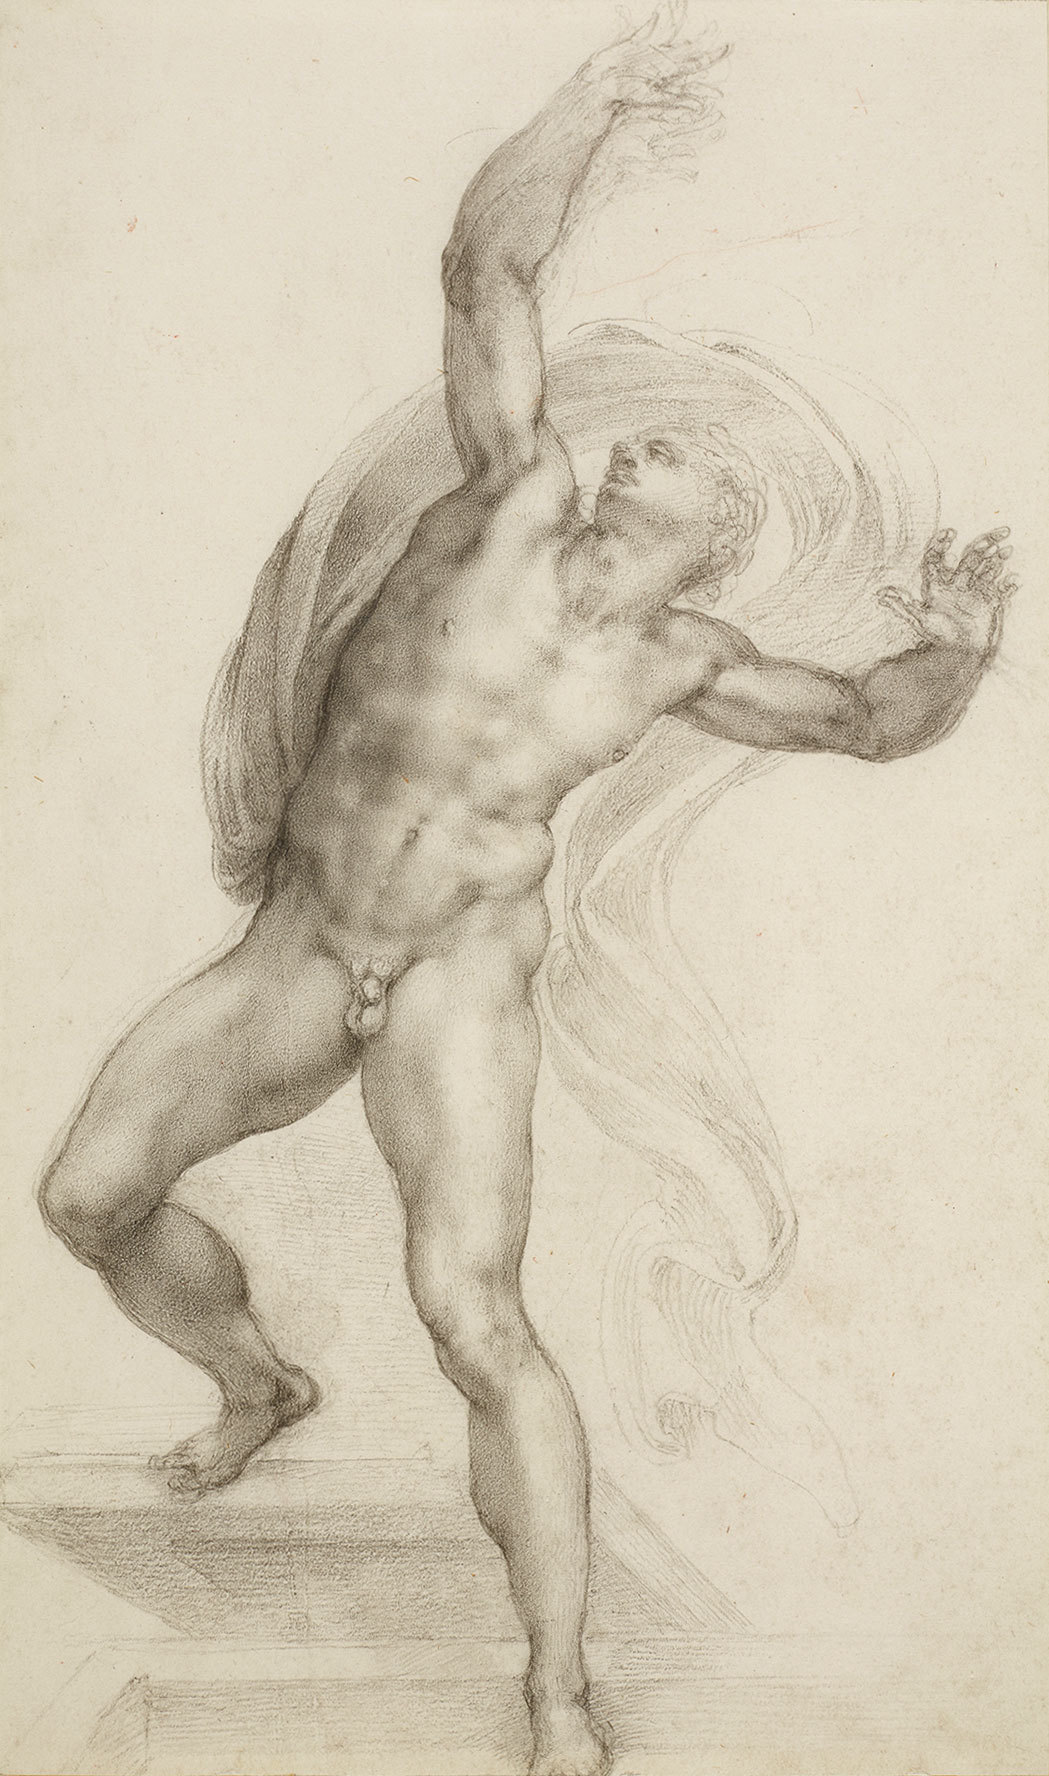 The Risen Christ by Michelangelo